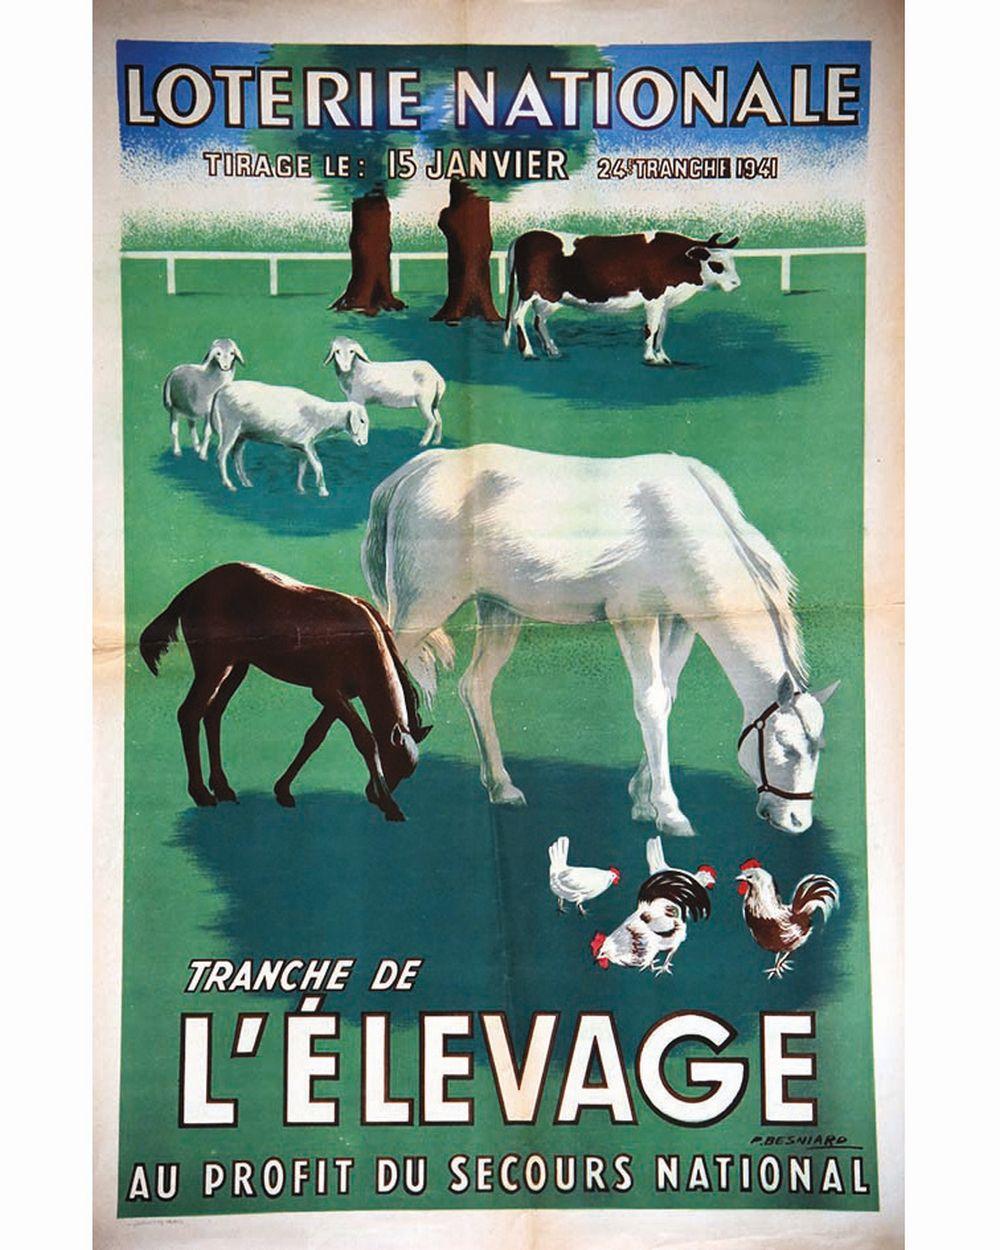 BESNIARD P. - L'élevage  Loterie Nationale     1941